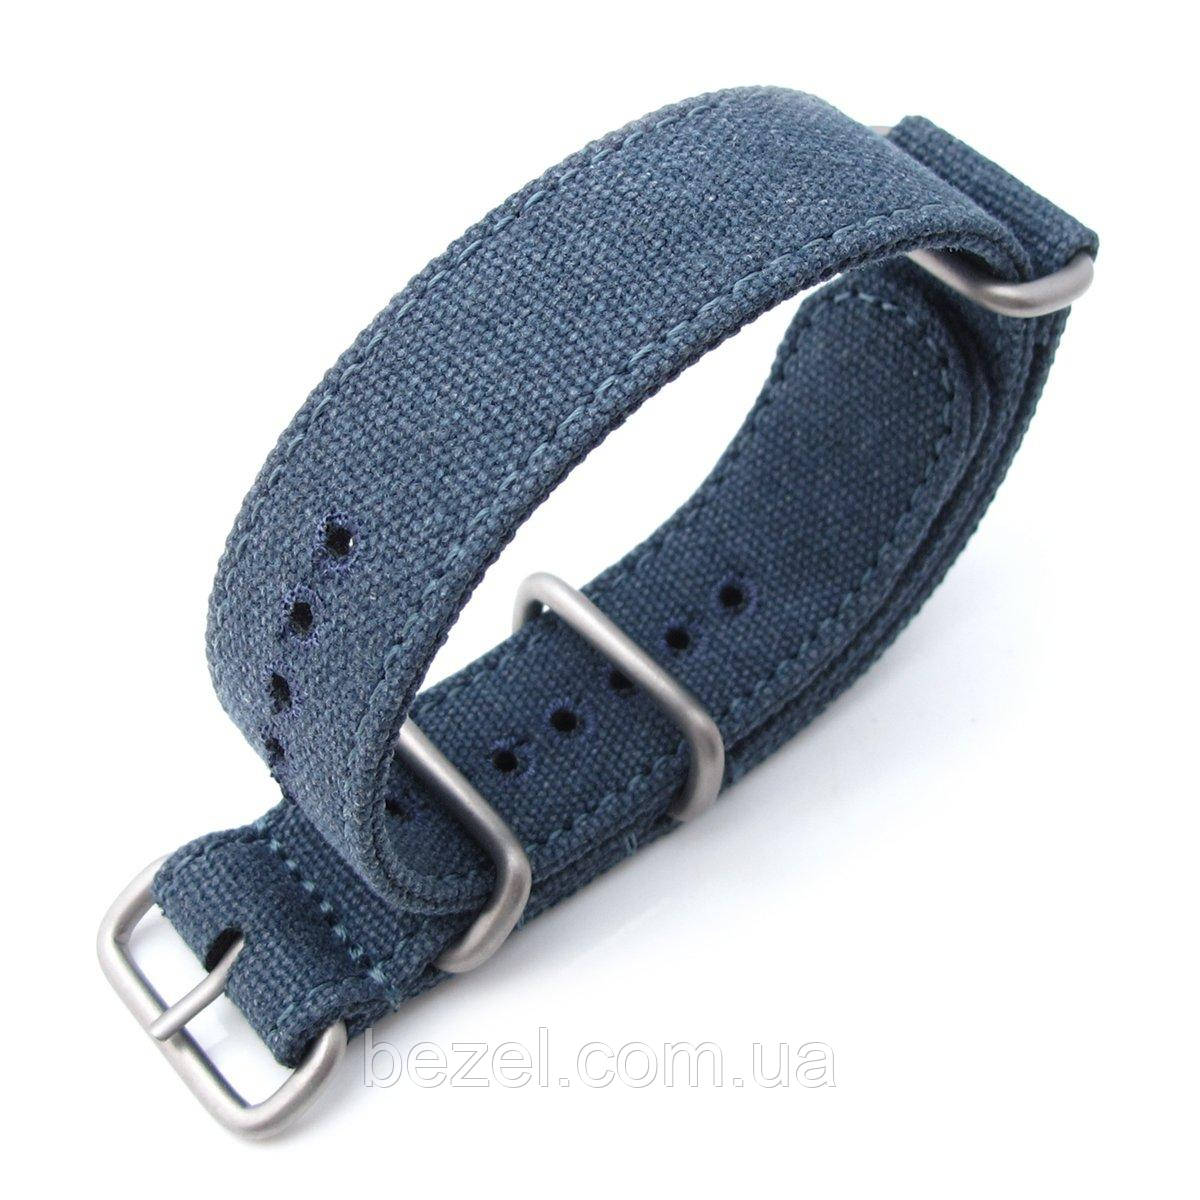 MiLTAT 20mm Washed Canvas Zulu Navy Blue Double Thickness Watch Strap, Lockstitch Round Hole